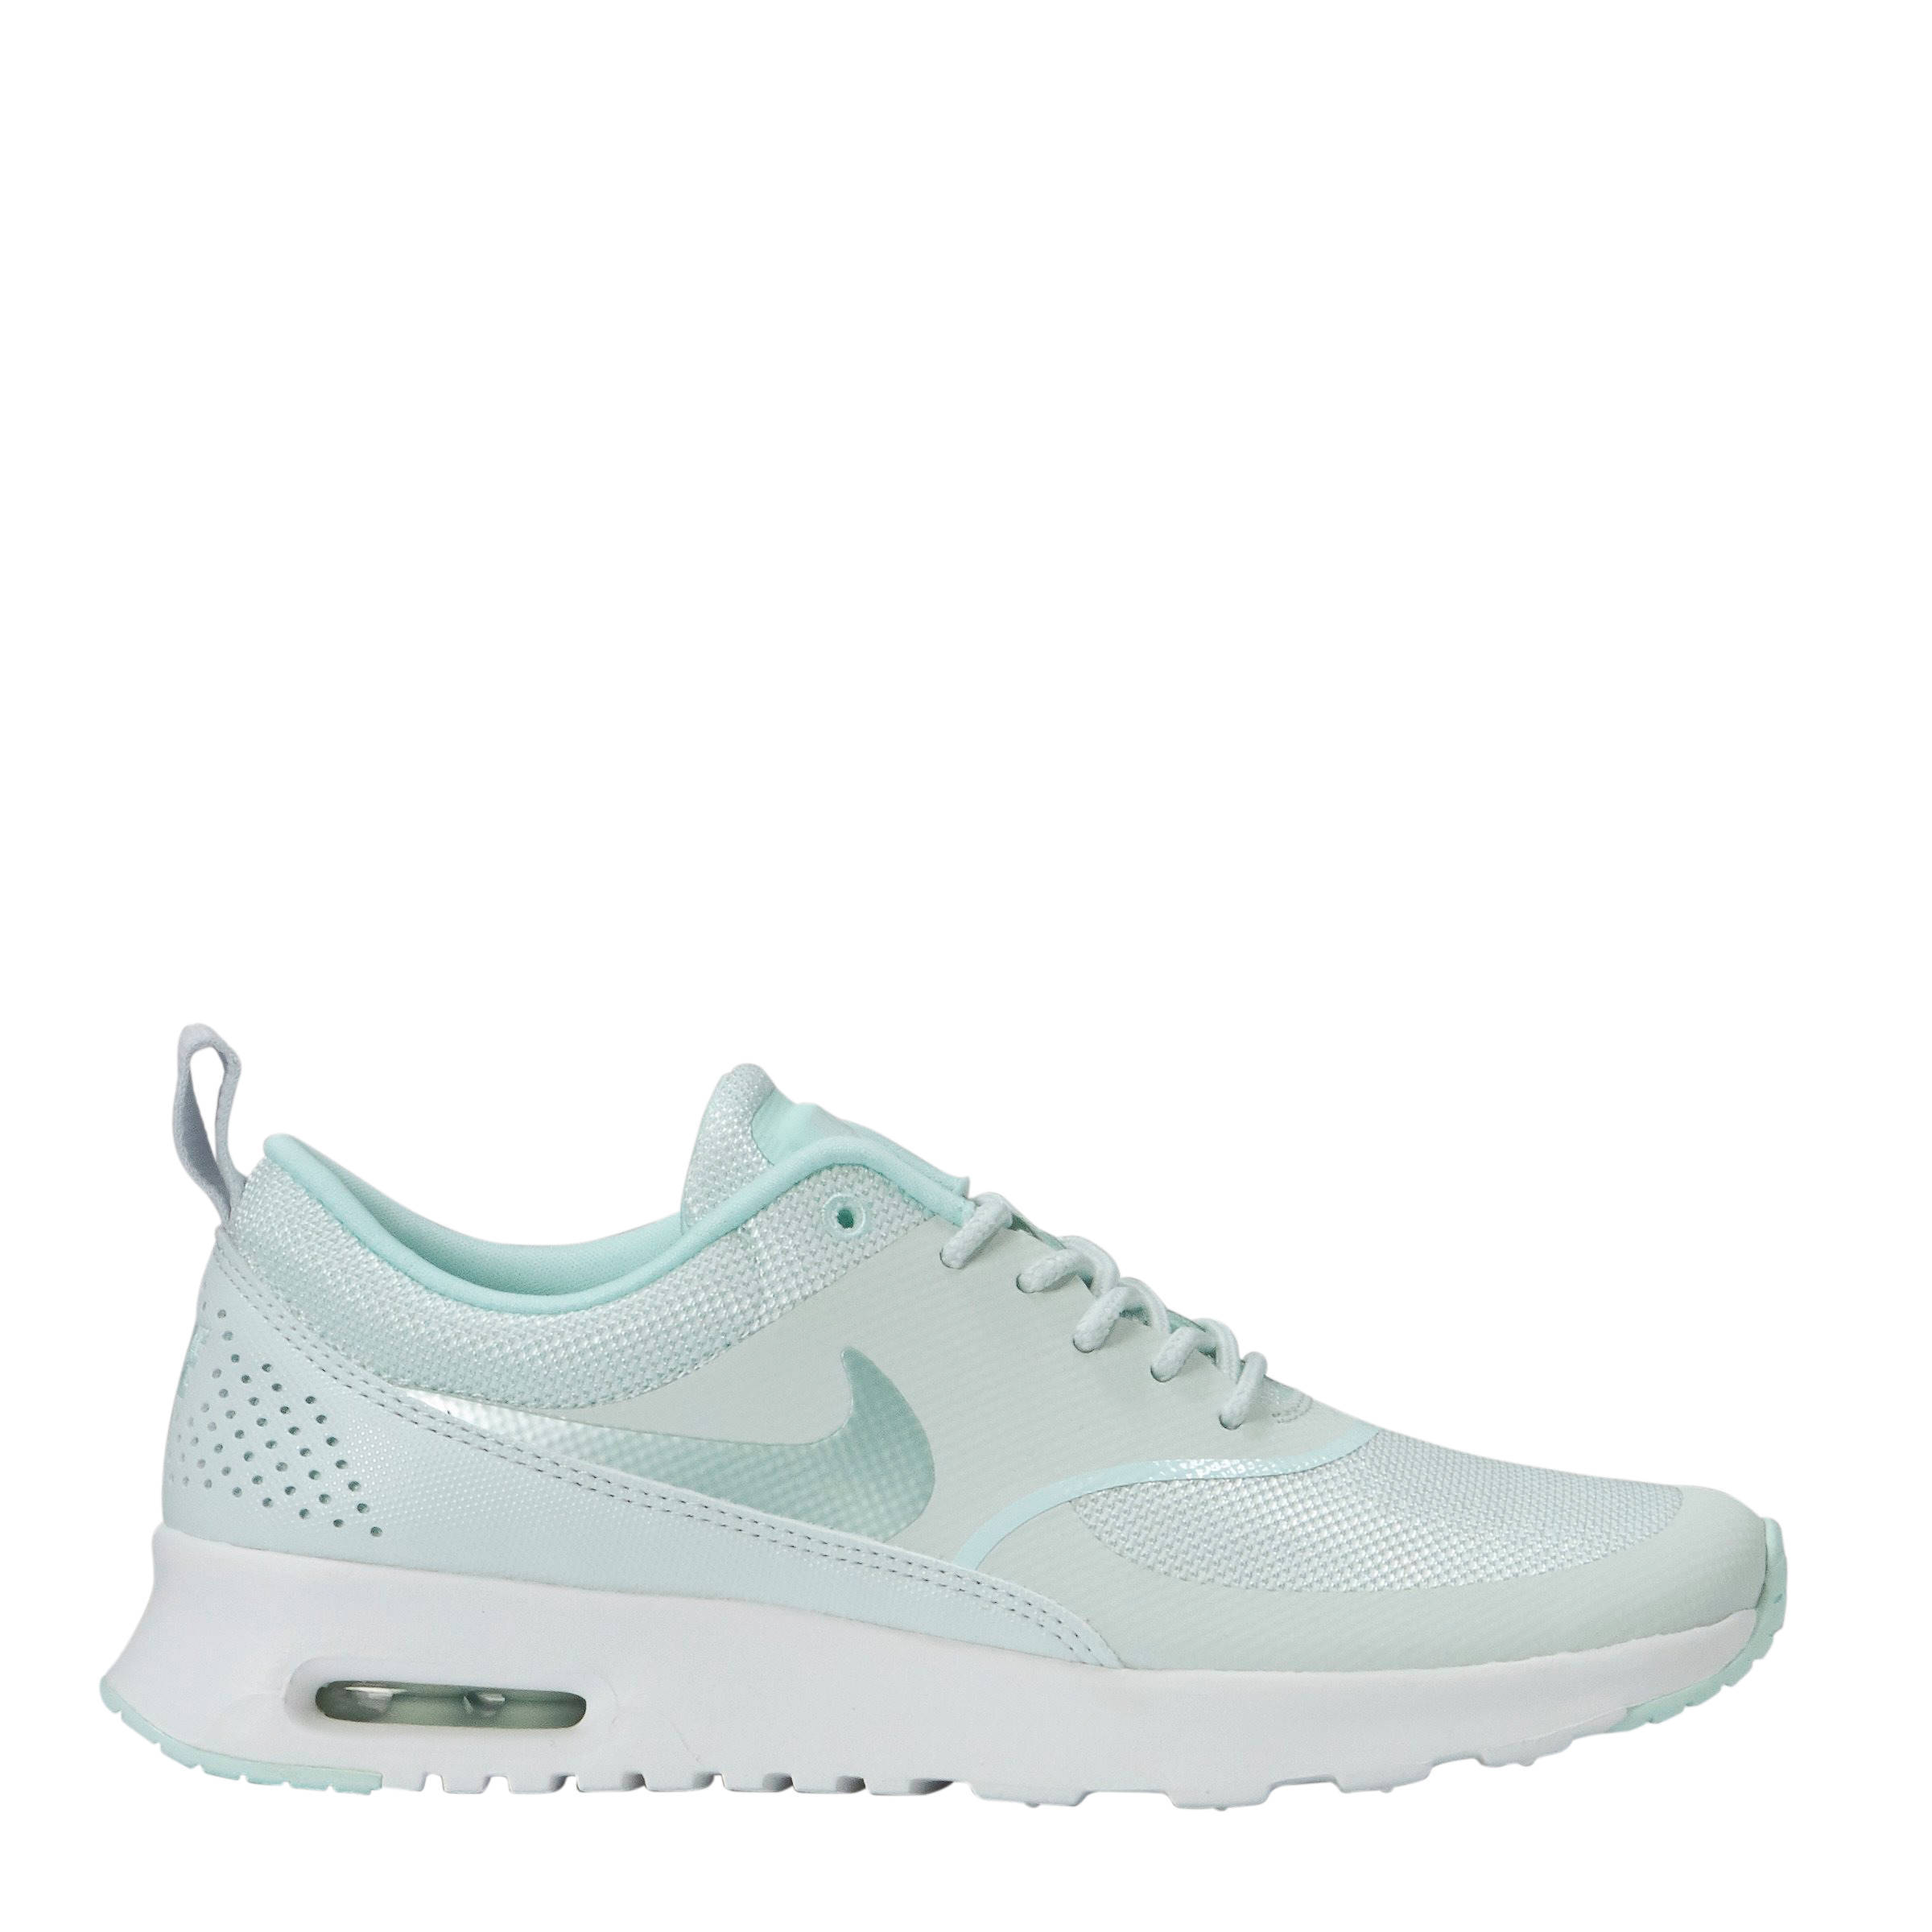 b0b6c3f045 nike-air-max-thea-sneakers-mintgroen-mintgroen-0887223374602.jpg